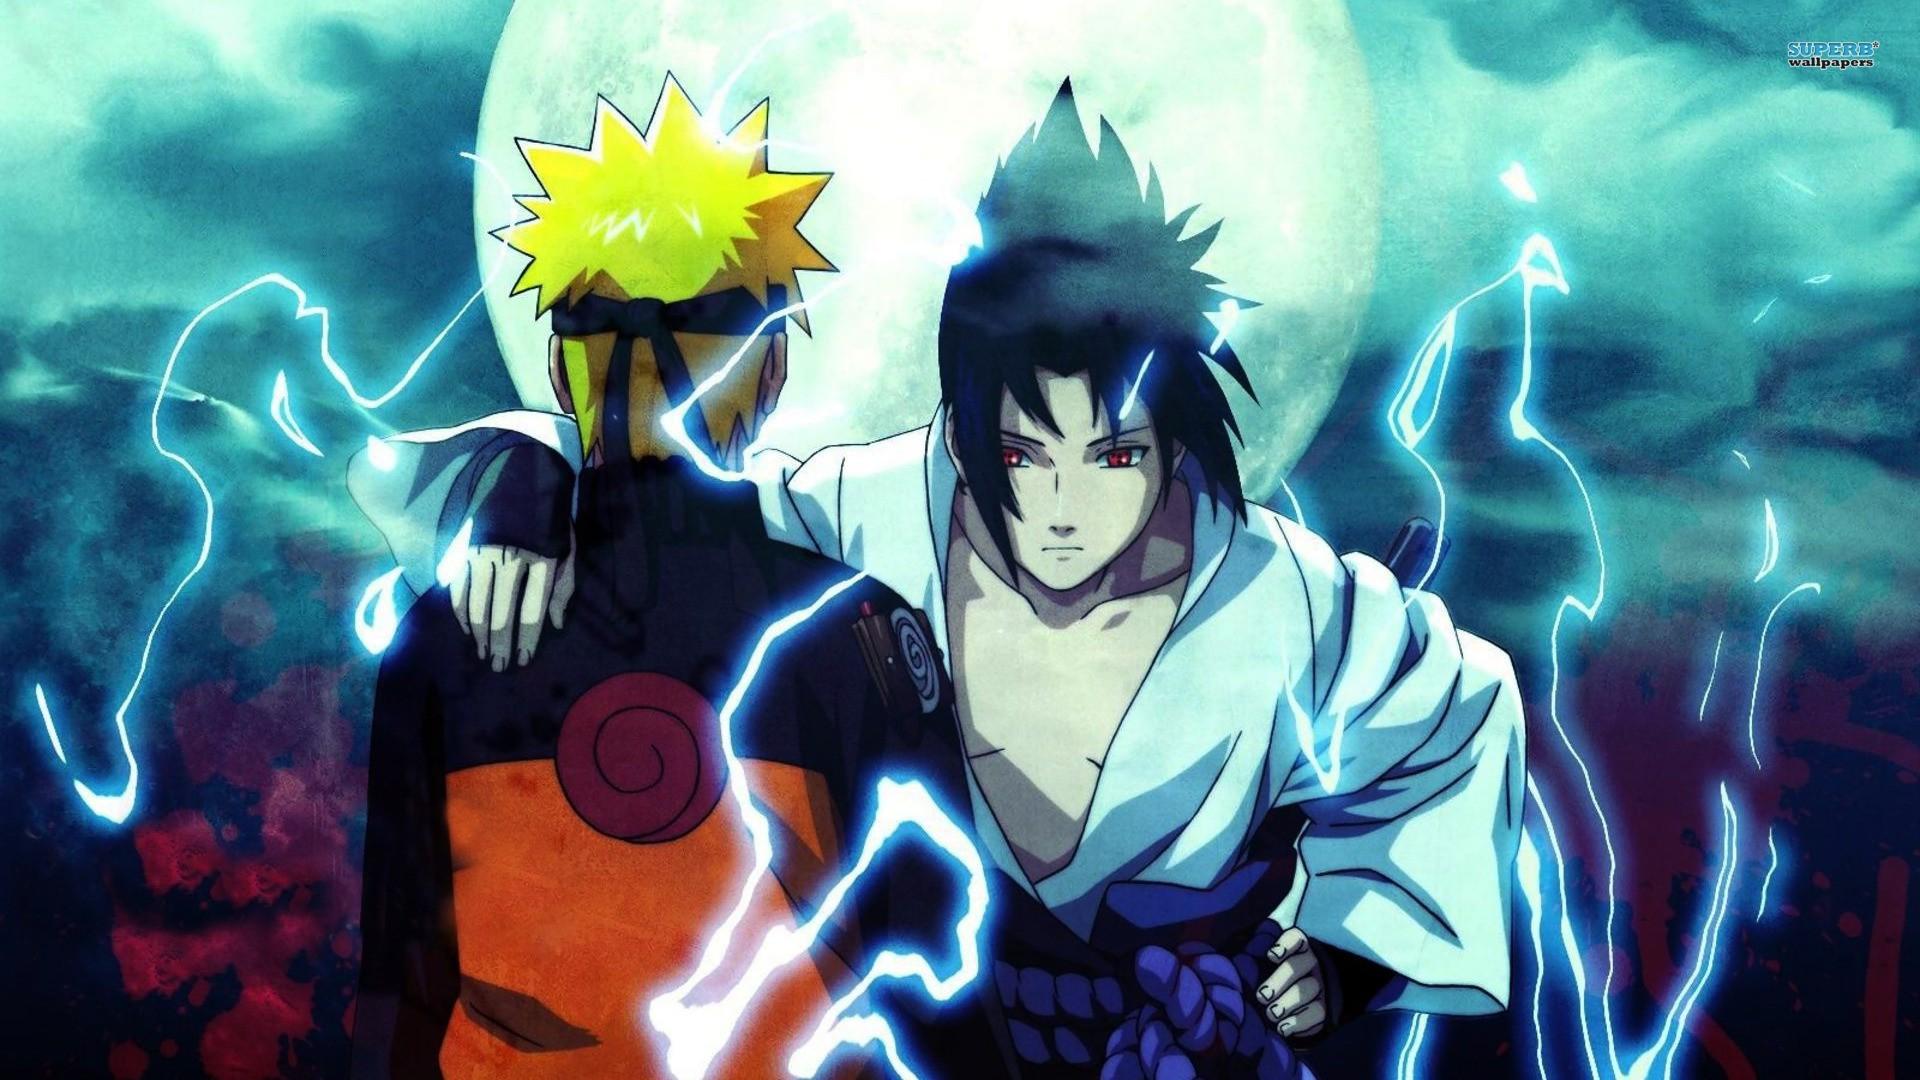 Naruto Sasuke Shippuden Pictures HD Wallpaper of Anime .